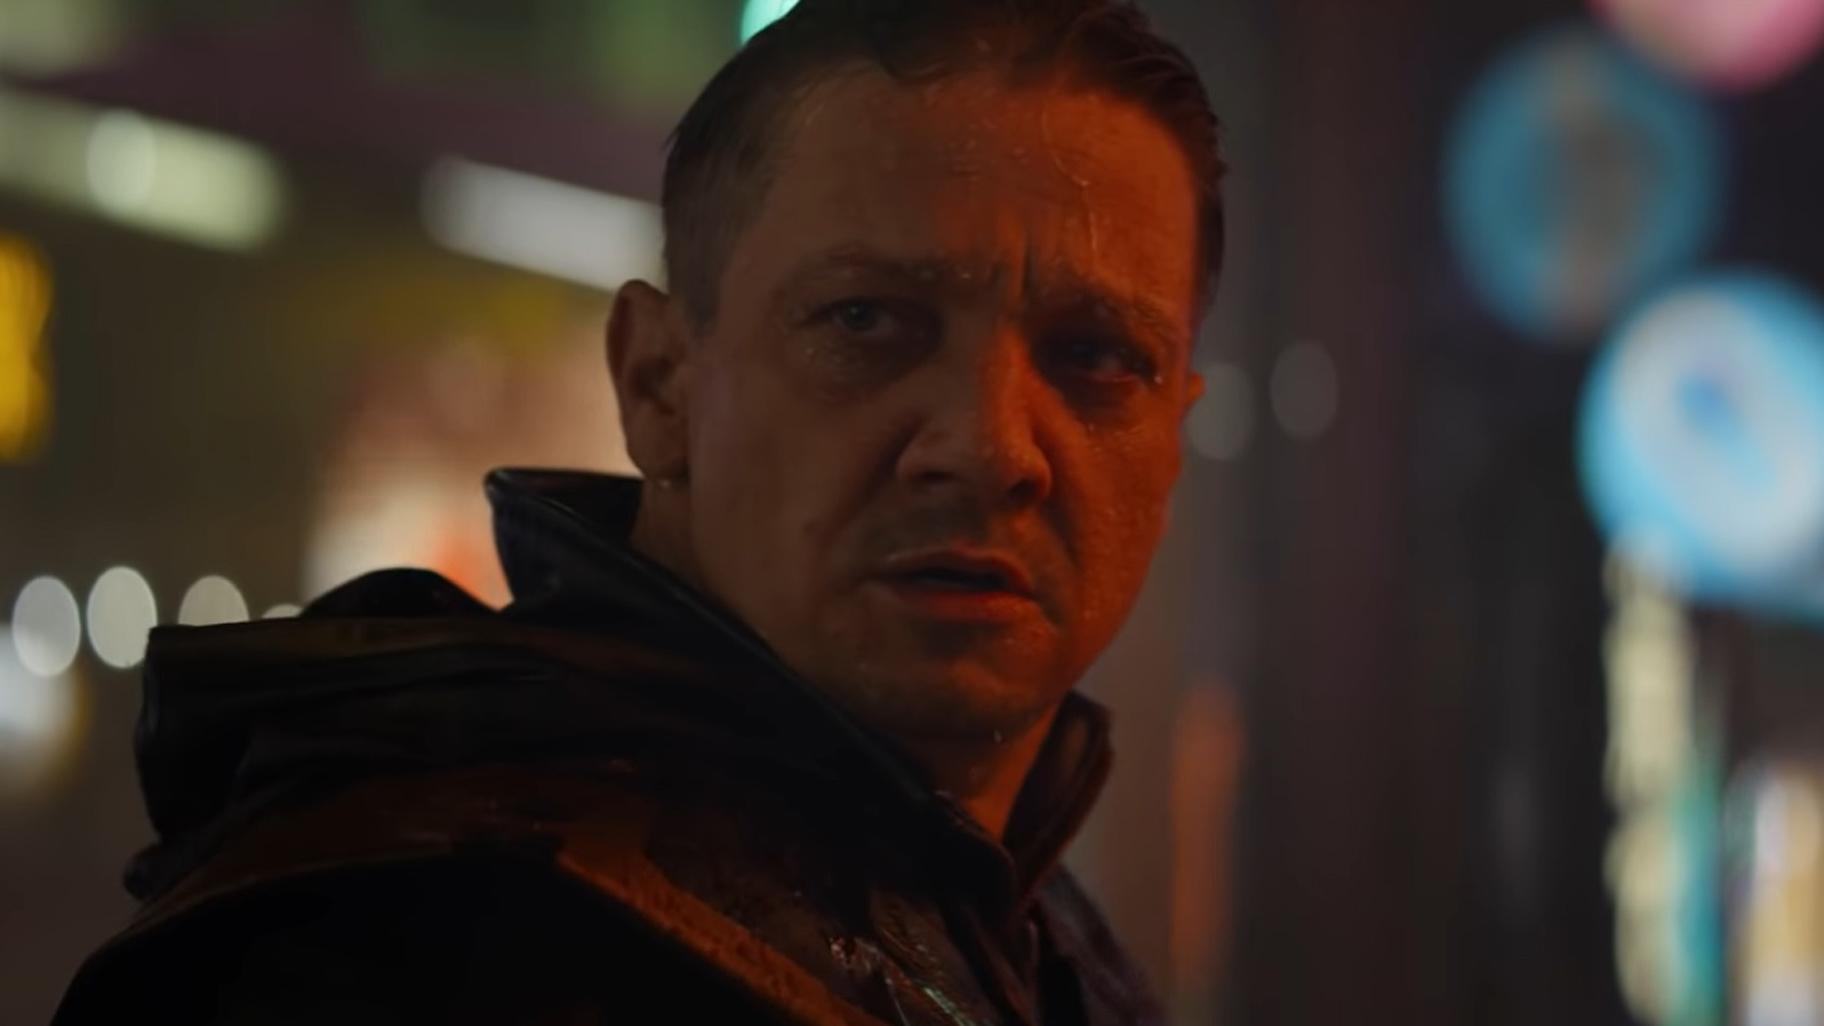 Ronin In Avengers Endgame Was Das Fur Hawkeyes Familie Bedeutet